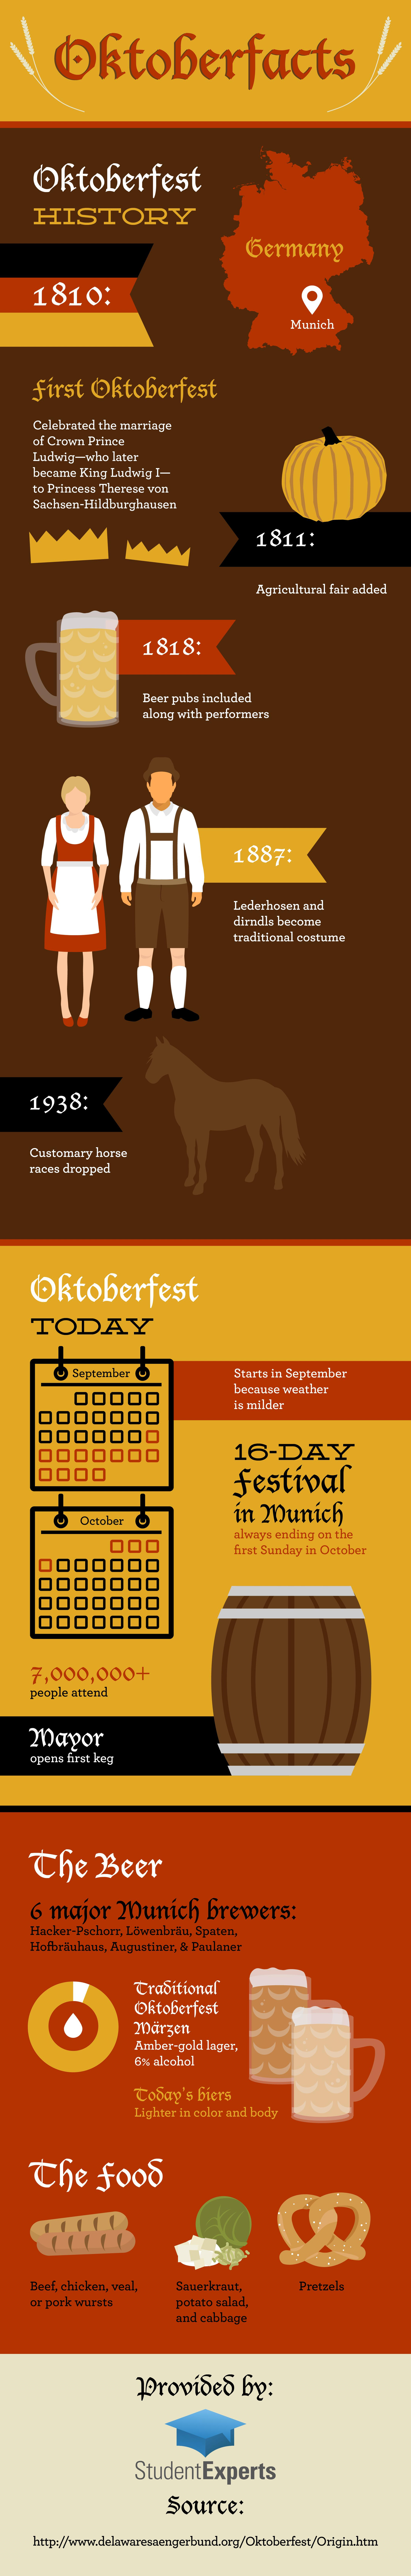 Oktoberfacts! Oktoberfest Infographic | Inspiration for raredirndl.com